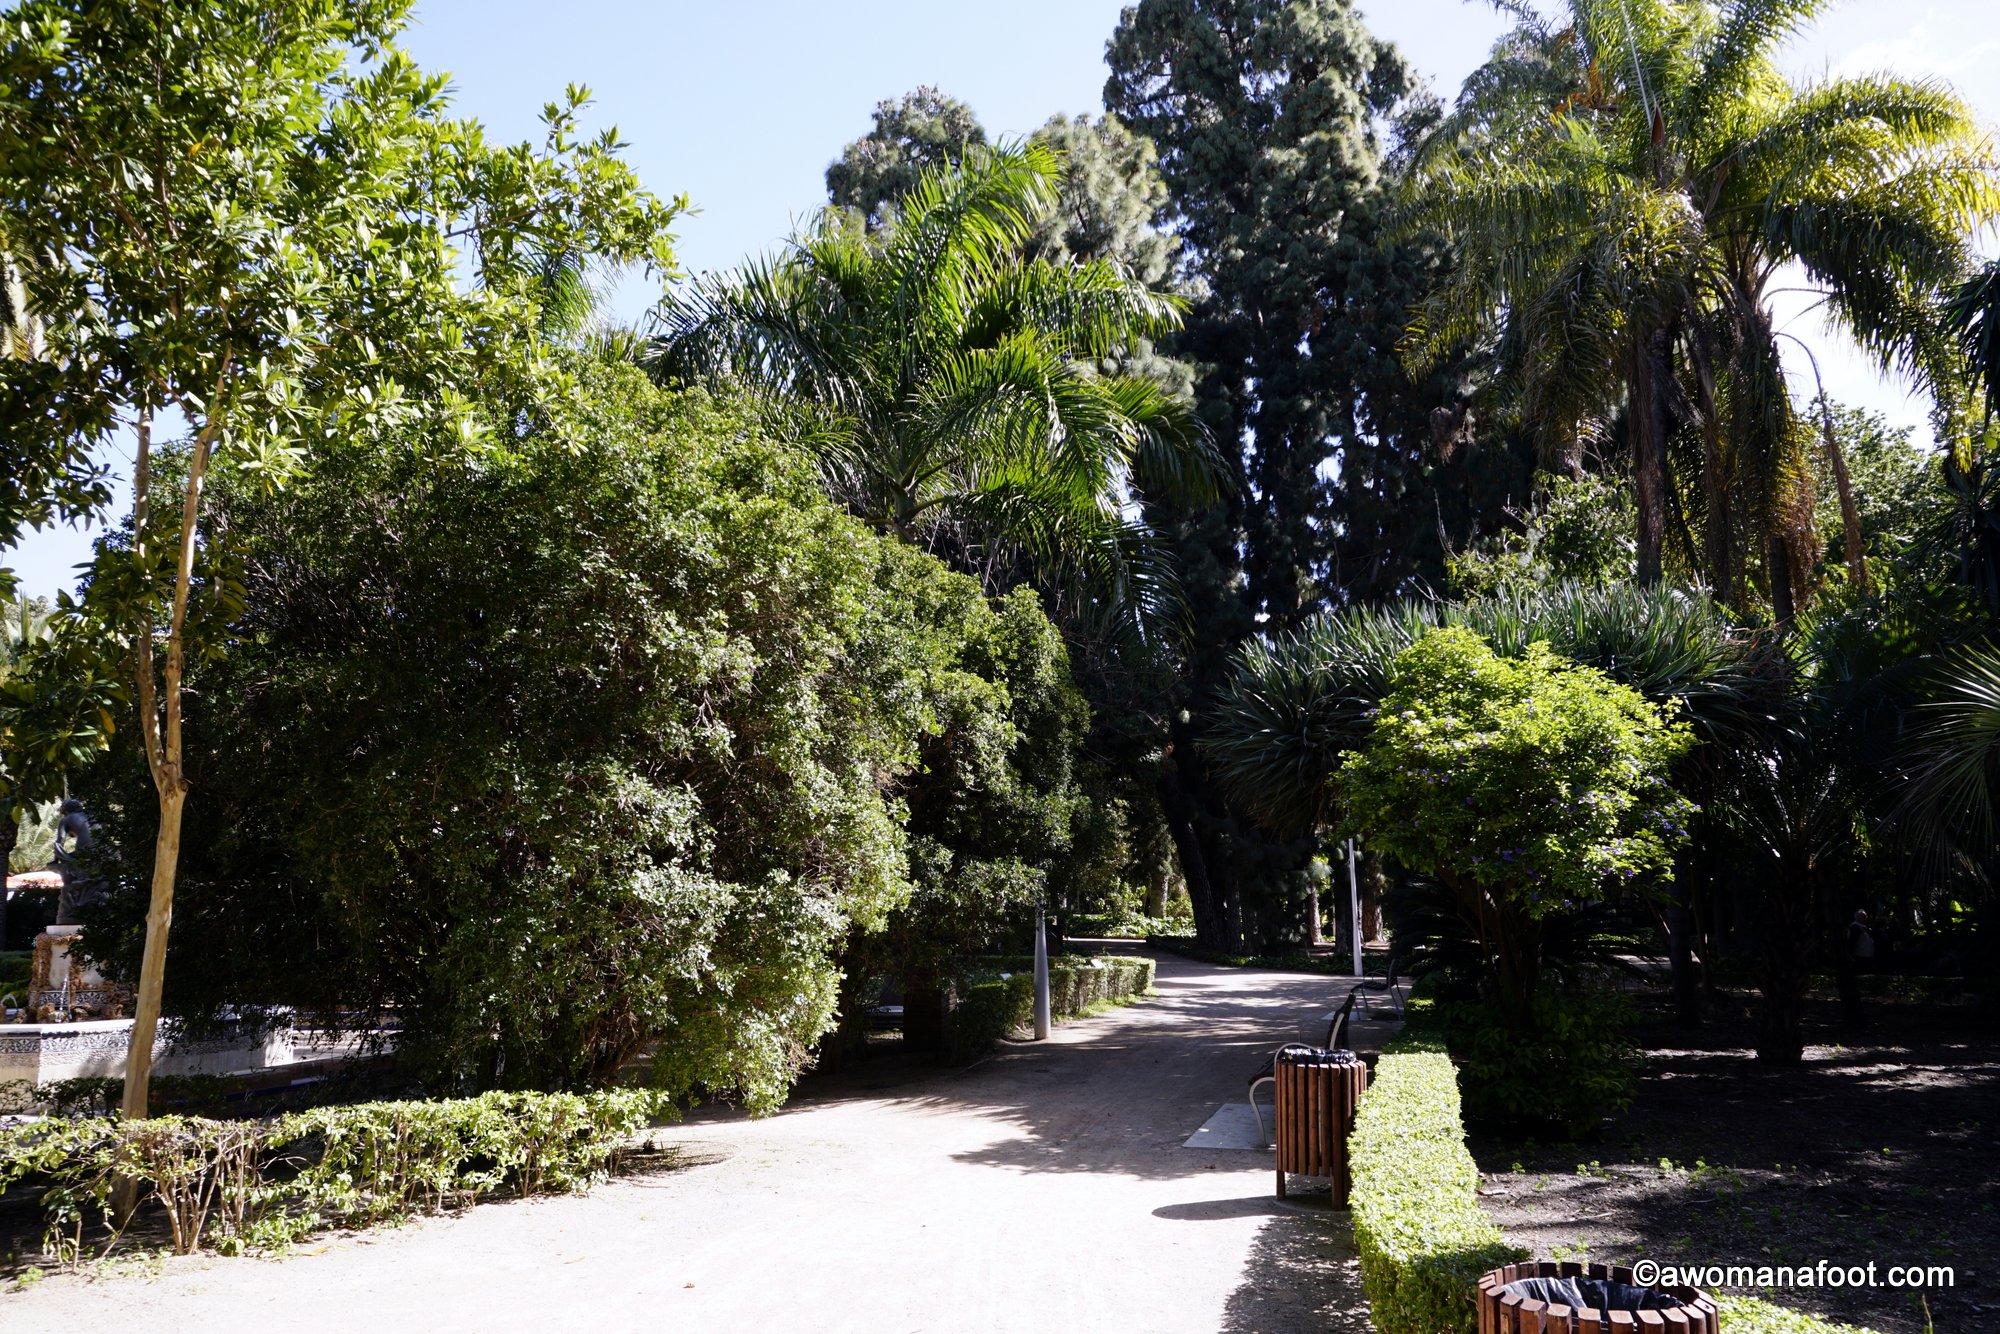 Malaga gardens greenery visit Spain